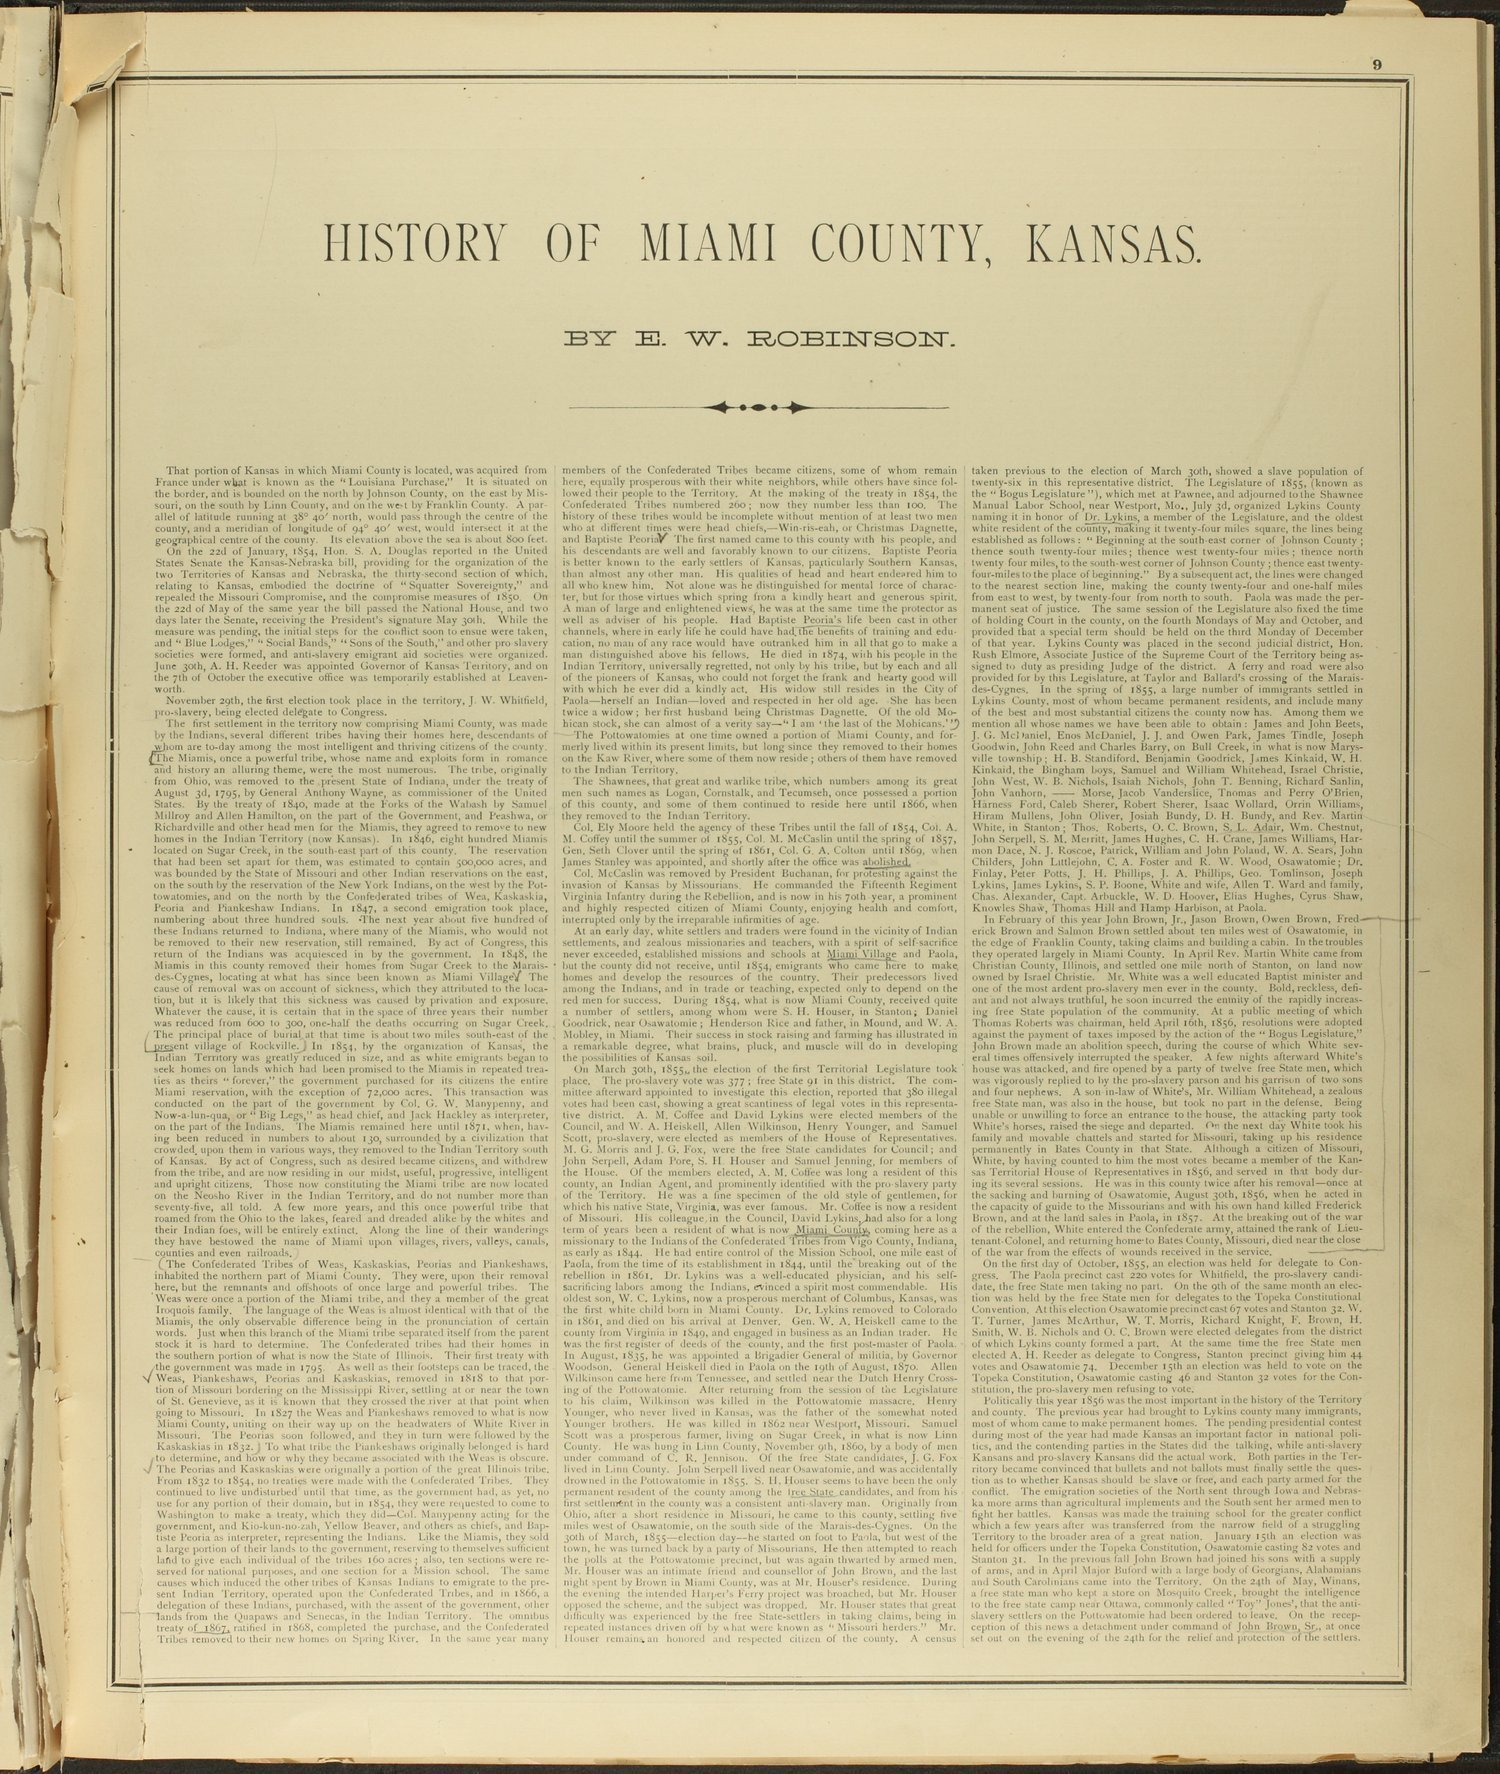 An illustrated historical atlas of Miami County, Kansas - 9